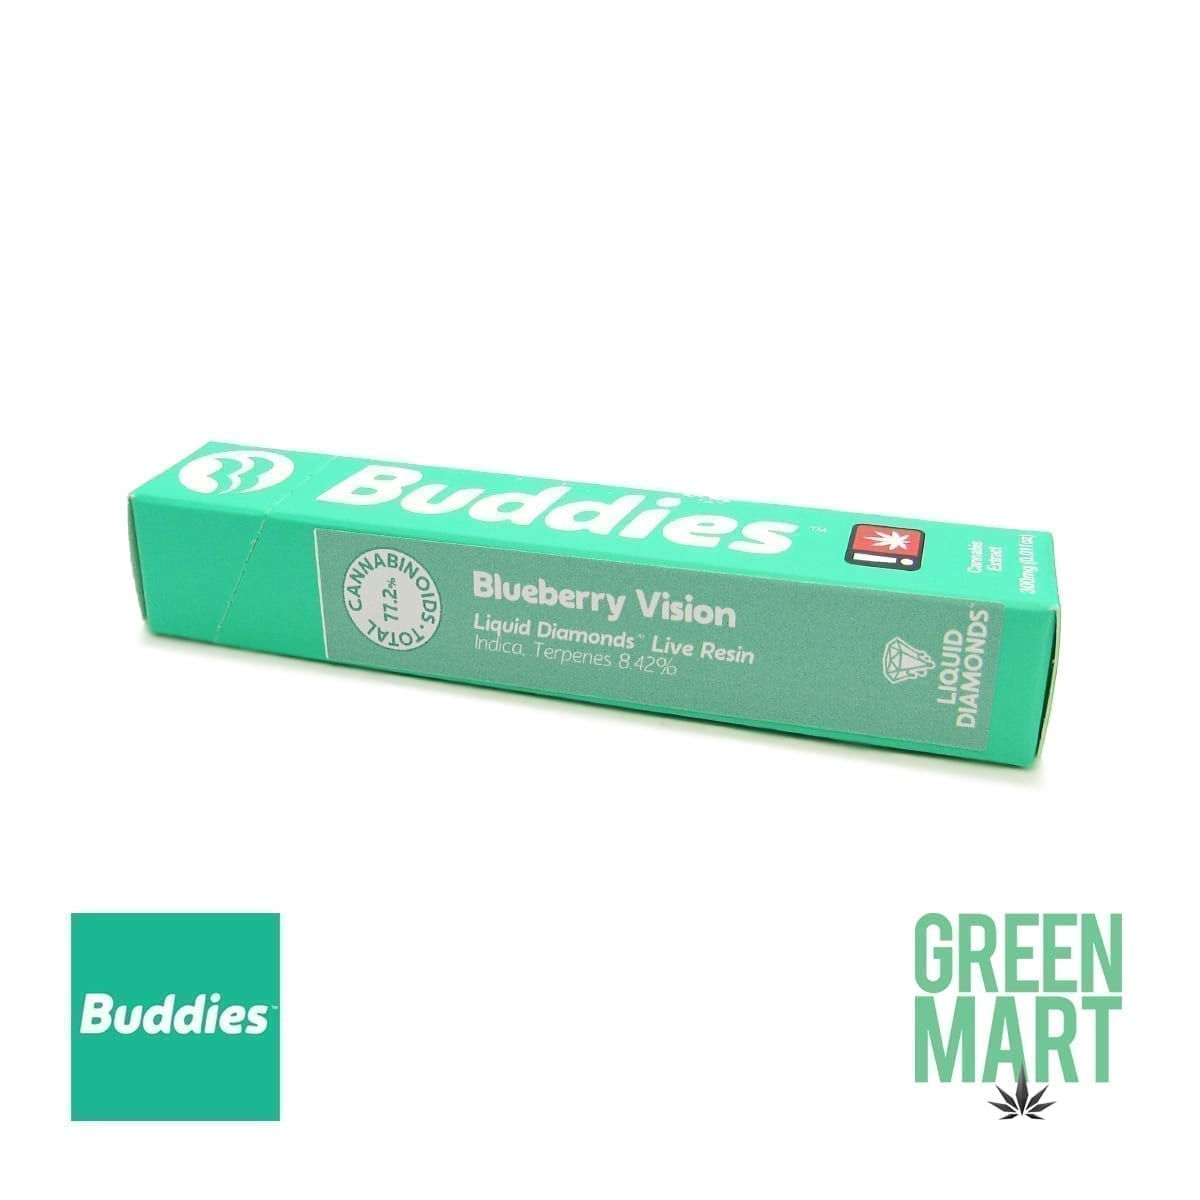 Buddies Brand Disposable Vape - Blueberry Vision